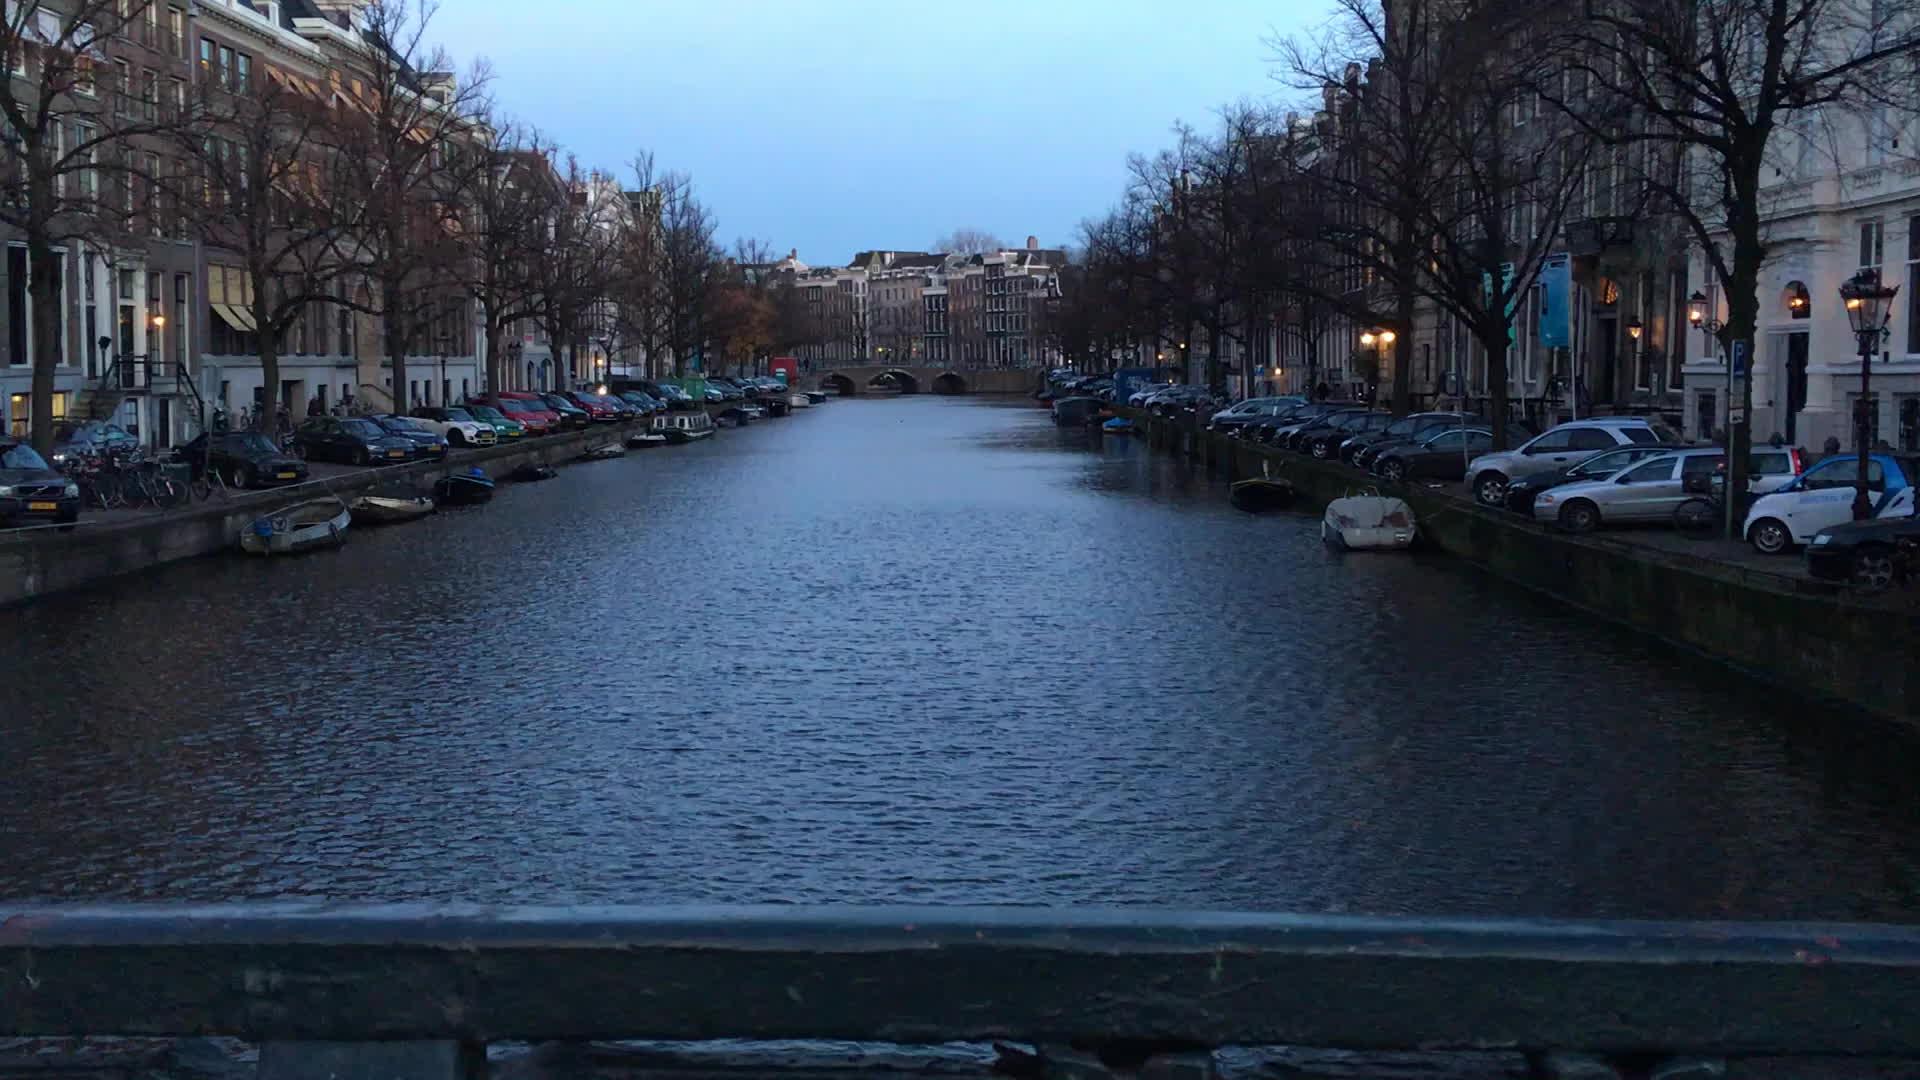 amsterdam, holland, netherlands, Amsterdam 2016 GIFs